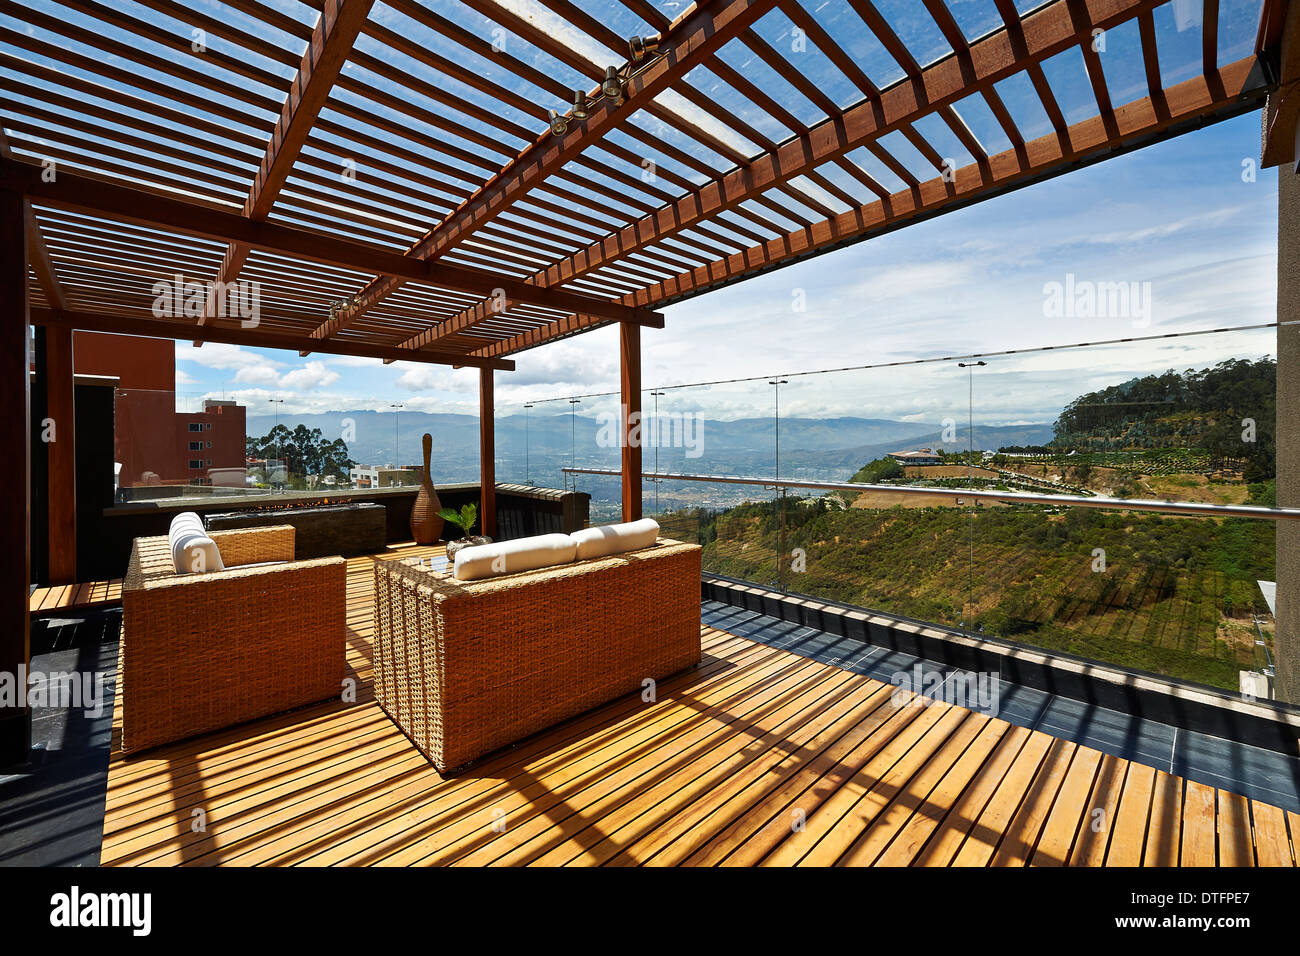 Interior design: Beautiful terrace lounge with pergola - Stock Image